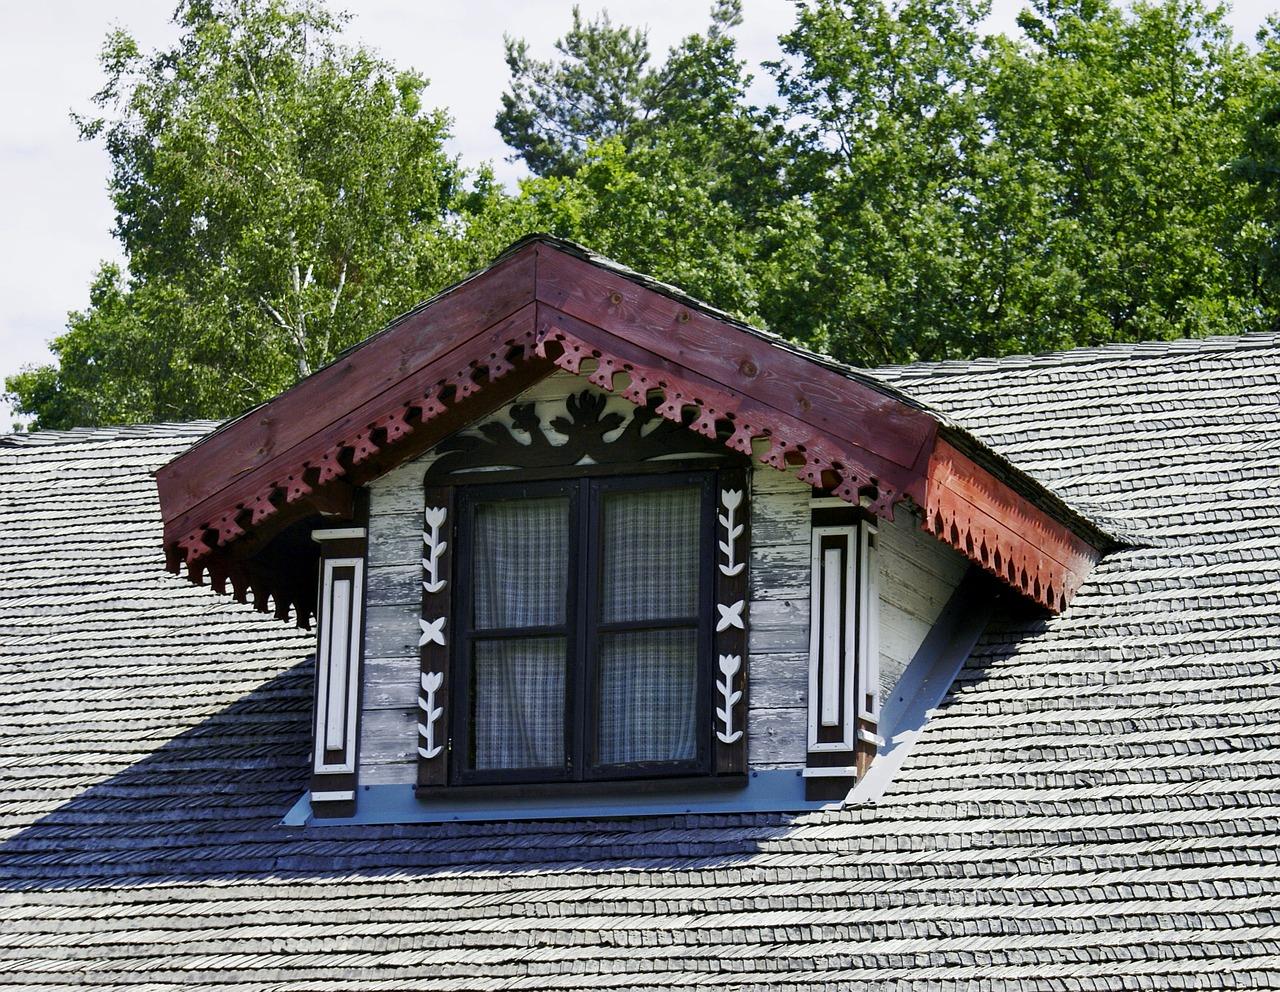 Prozor kosi krov